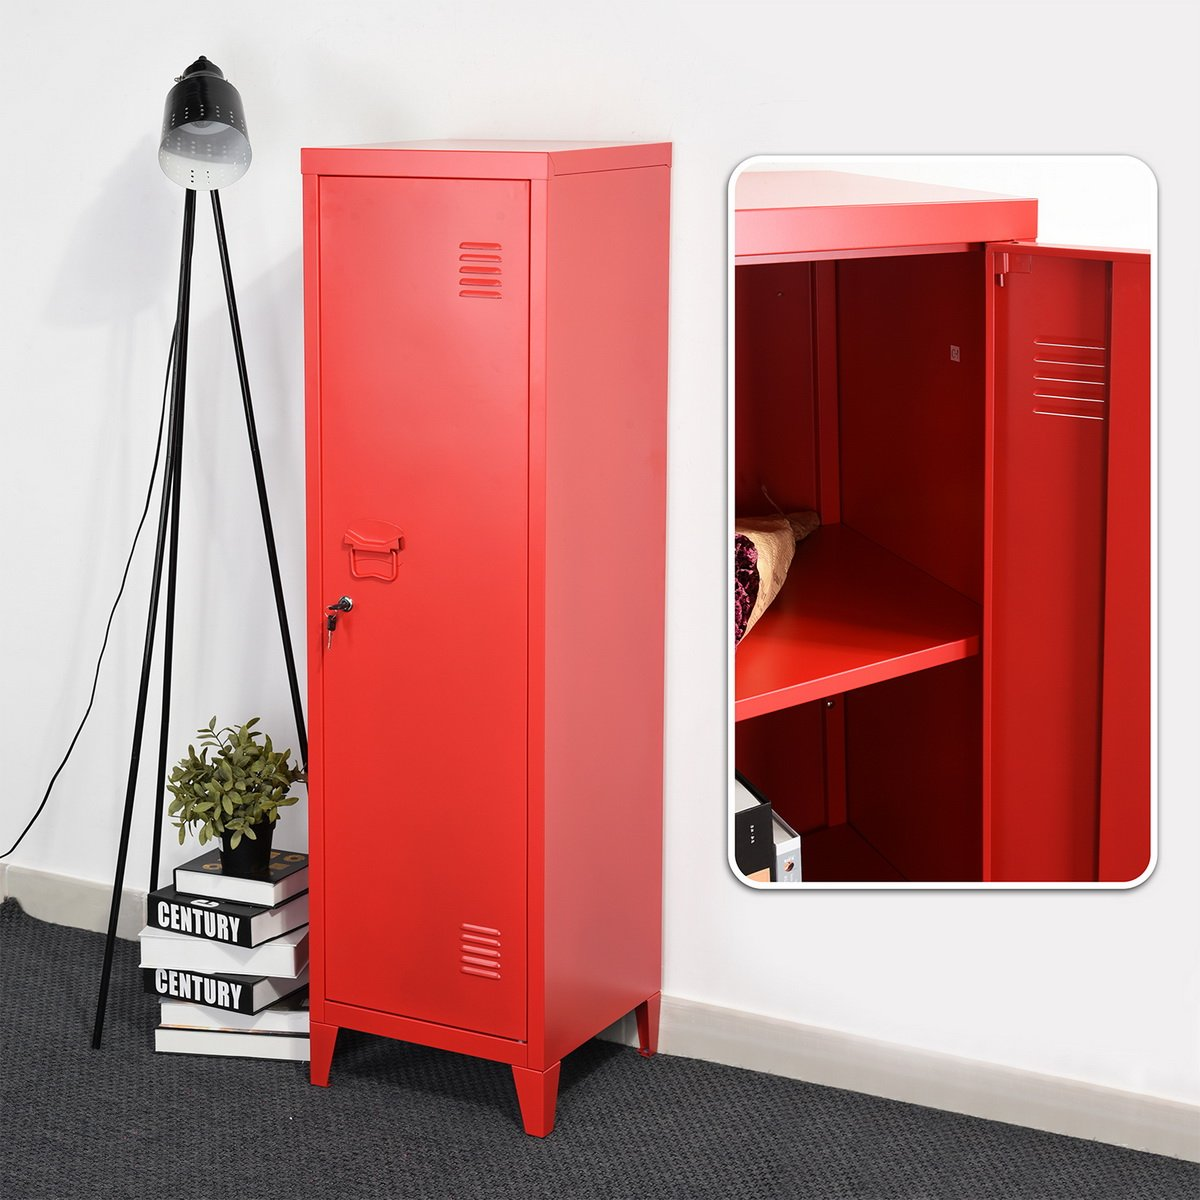 HouseinBox Office File Storage Metal Cabinet 3 Door Cupboard Locker Organizer Console Stand 3-in-1 (RED-Standing Locker) by HouseinBox (Image #6)